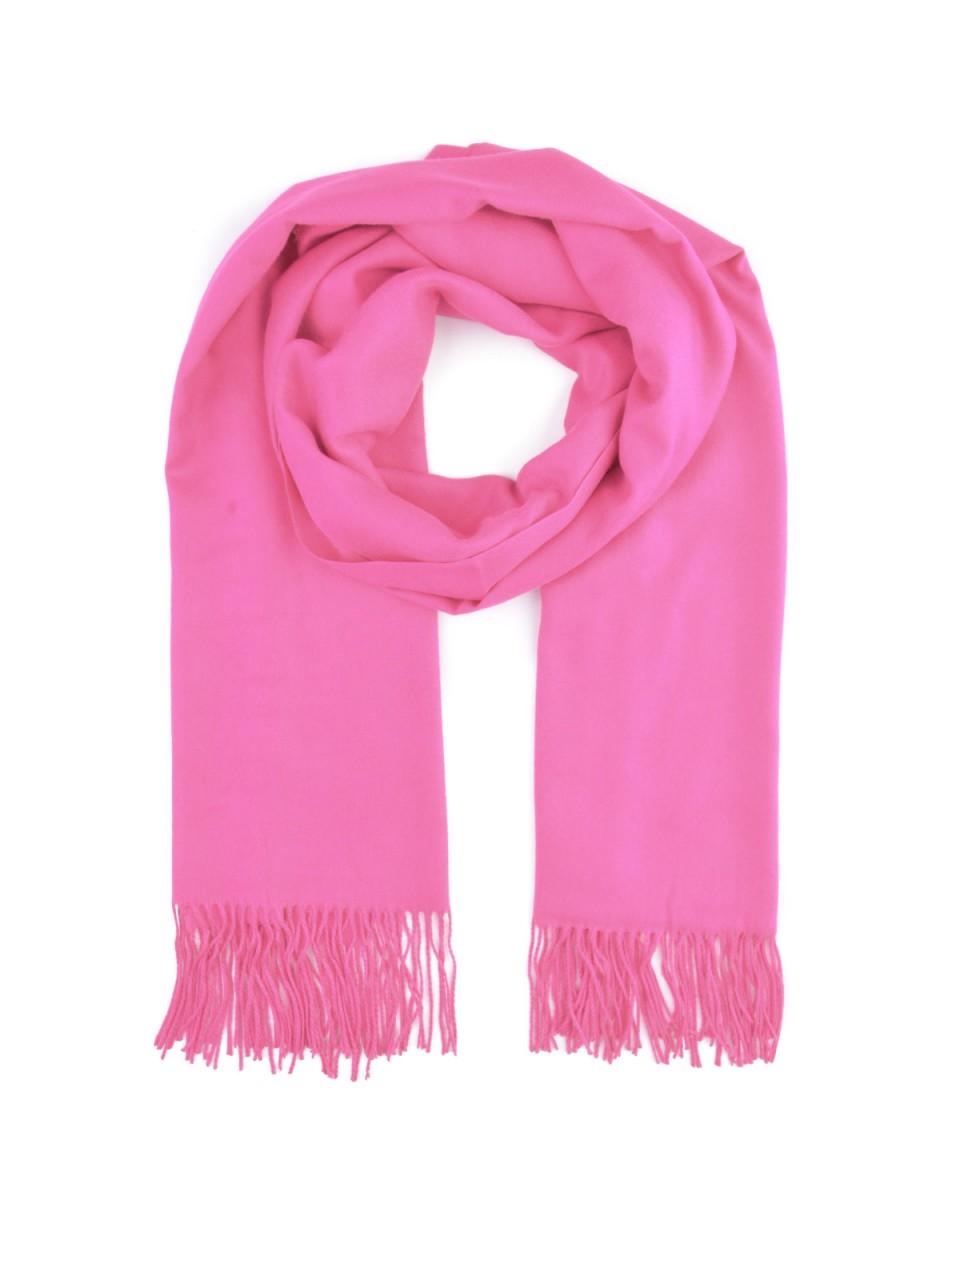 Schals - MILANO ITALY Damen Schal, pink  - Onlineshop Designermode.com